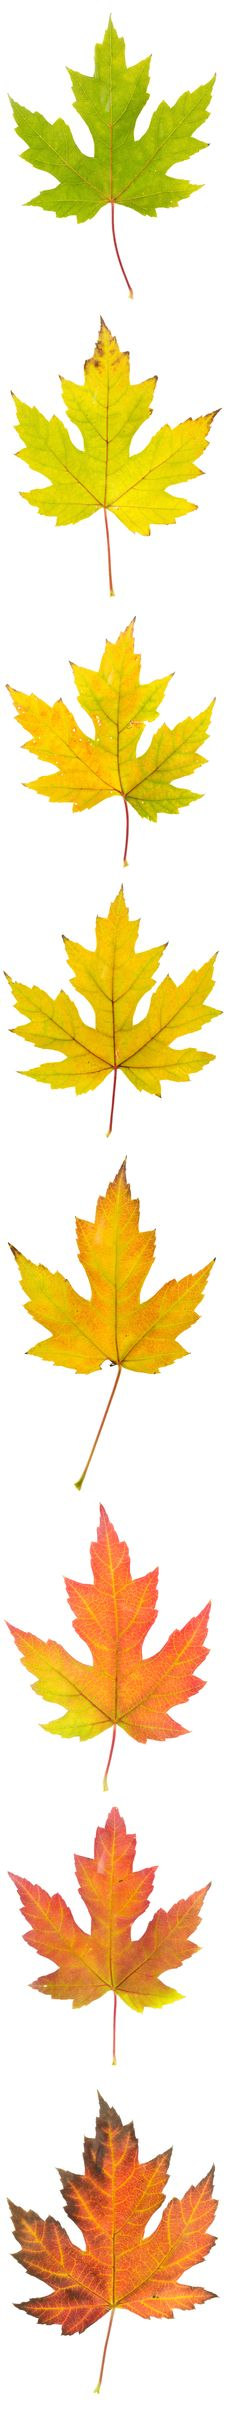 Free Autumn Colors Montage Royalty Free Stock Photos - 22958448